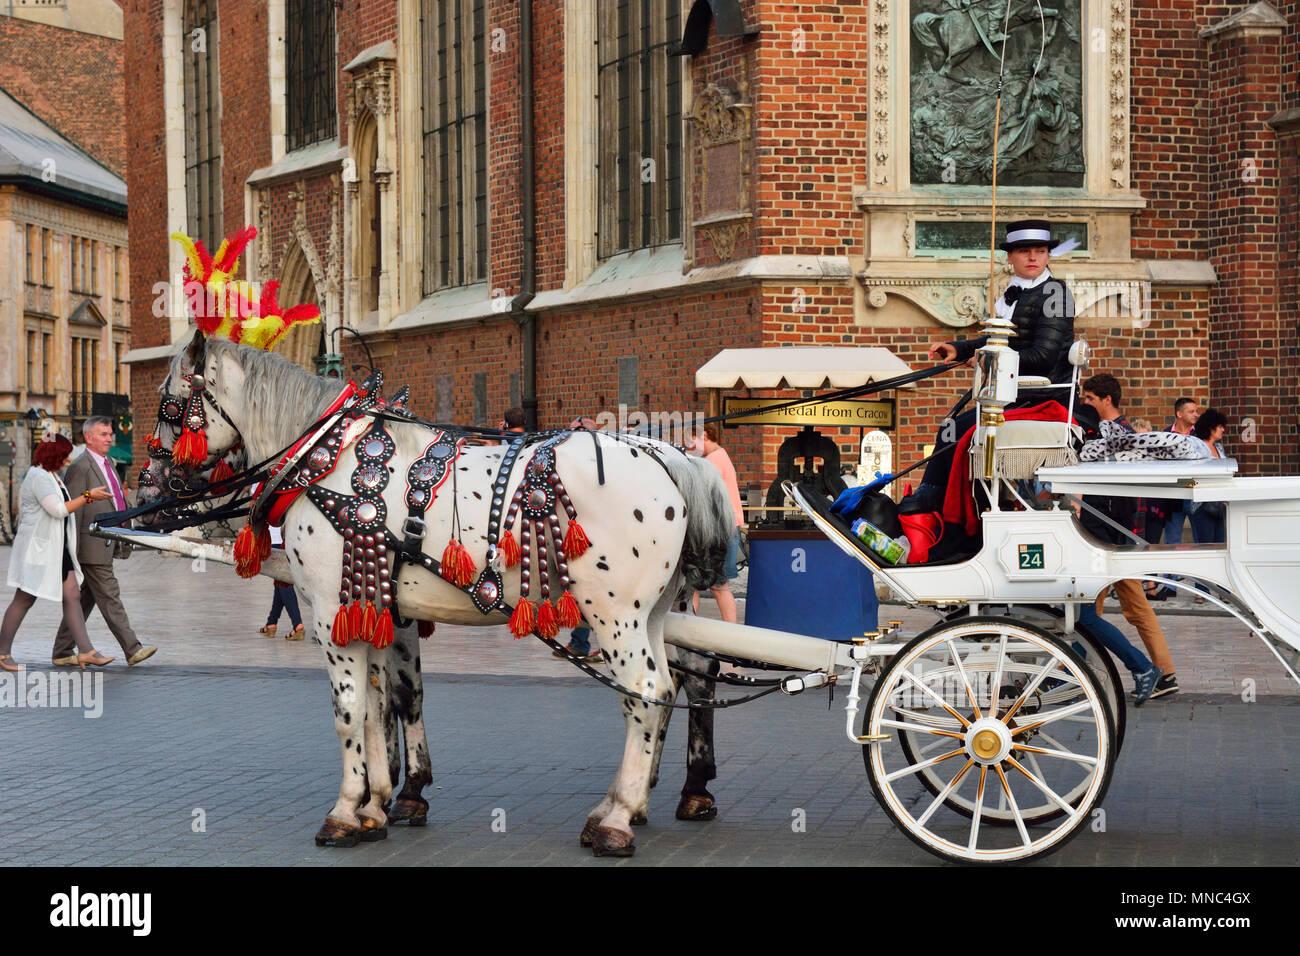 Carruaje de caballos tradicional en la plaza principal de Cracovia. Polonia Imagen De Stock